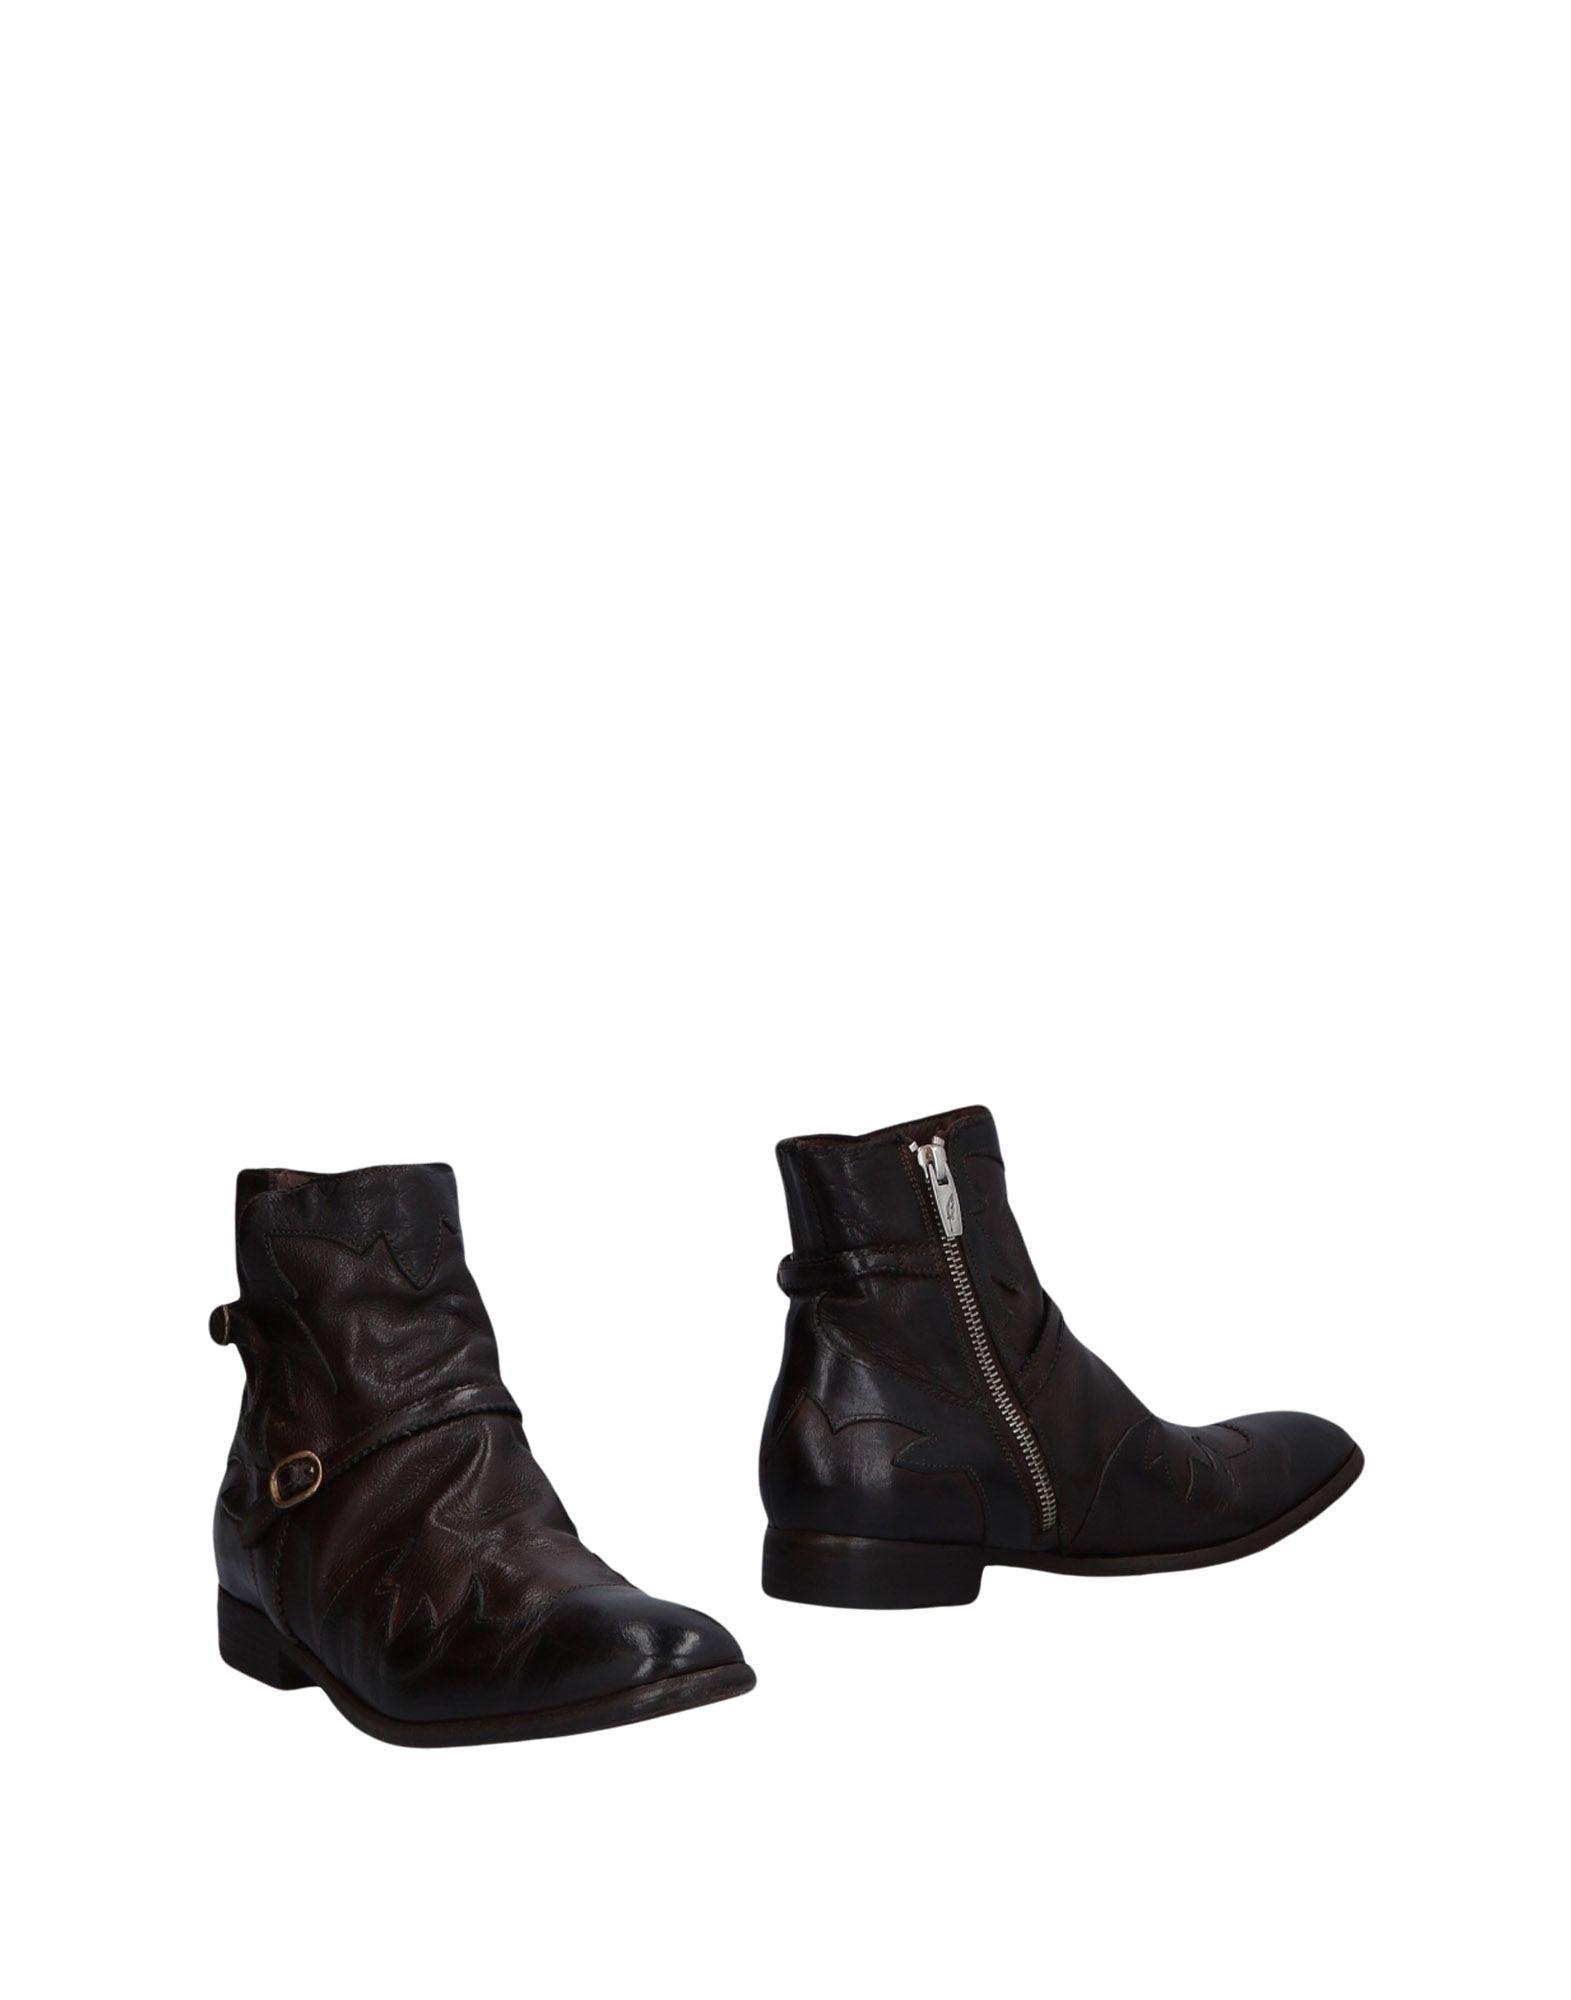 I.N.K. Shoes Stiefelette Damen Schuhe  11474745JTGut aussehende strapazierfähige Schuhe Damen 667ae2